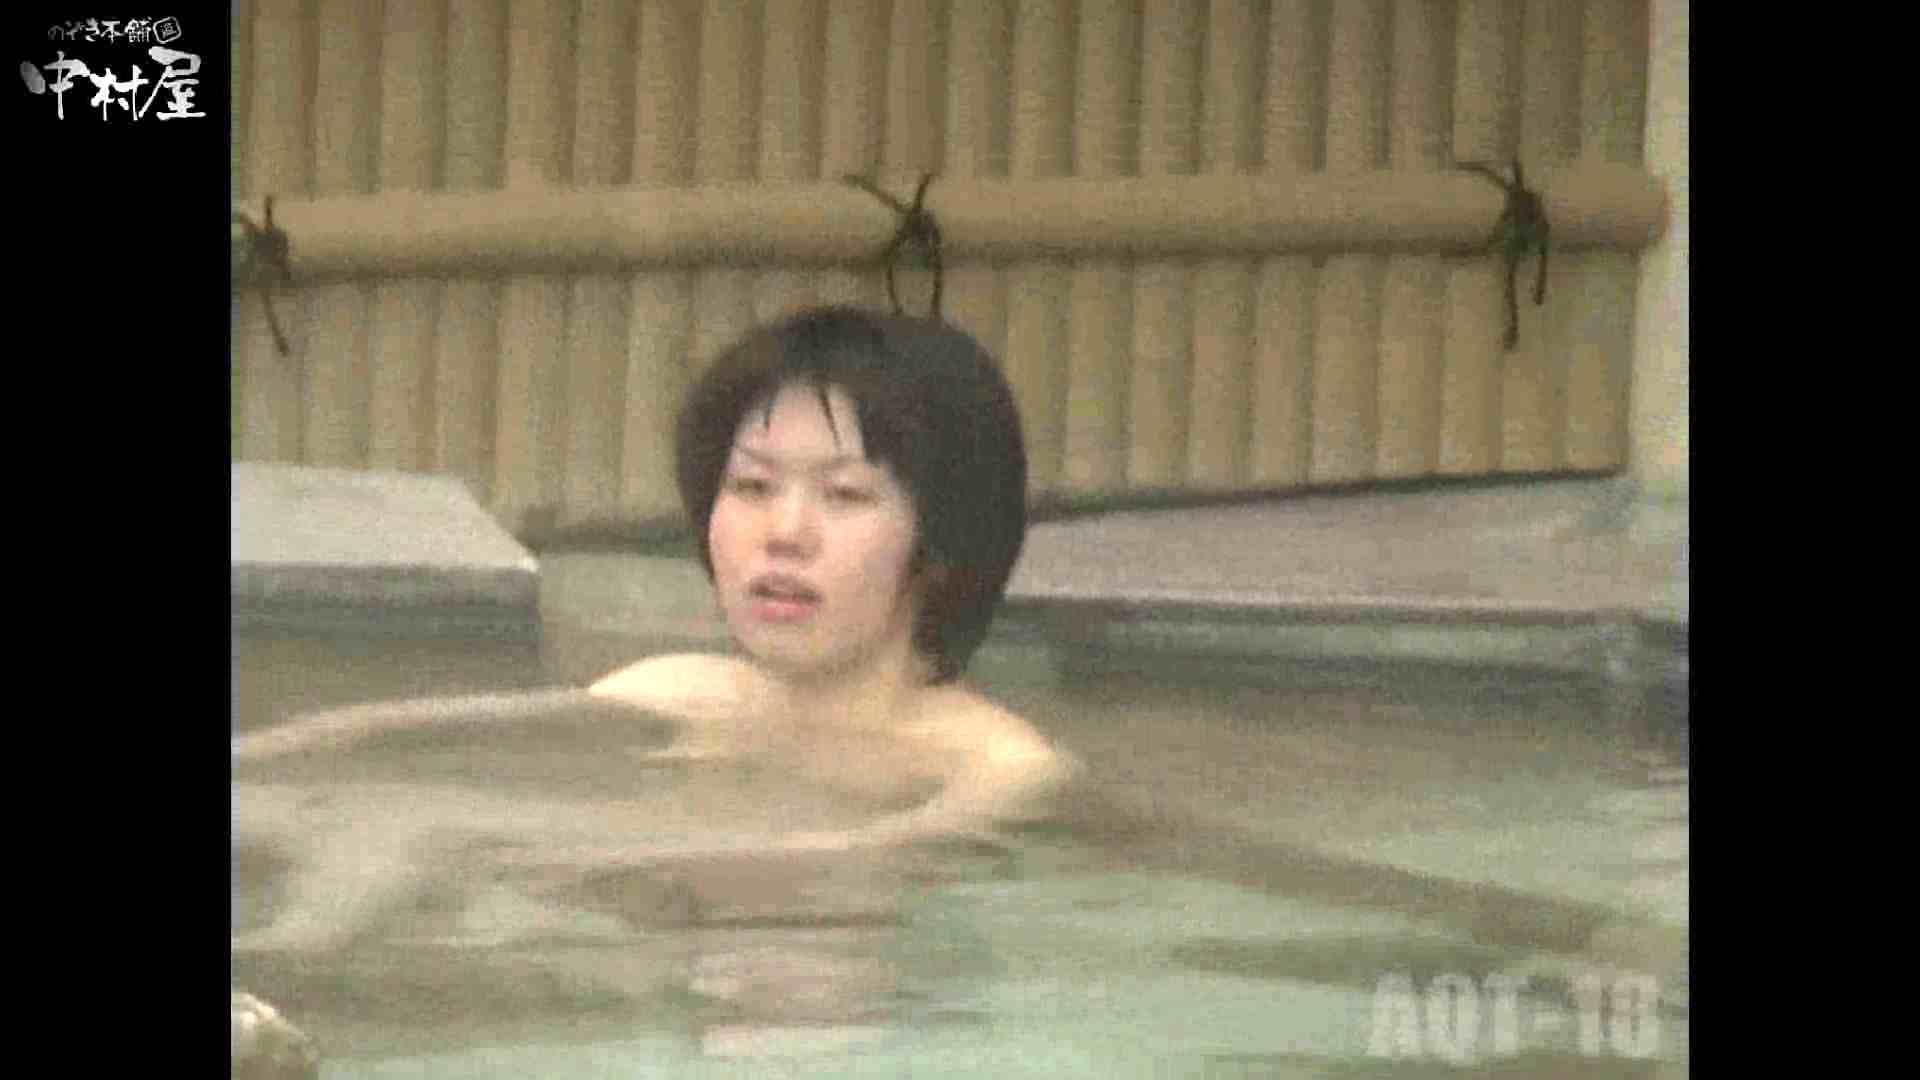 Aquaな露天風呂Vol.882潜入盗撮露天風呂十八判湯 其の七 盗撮 | 潜入  113連発 5